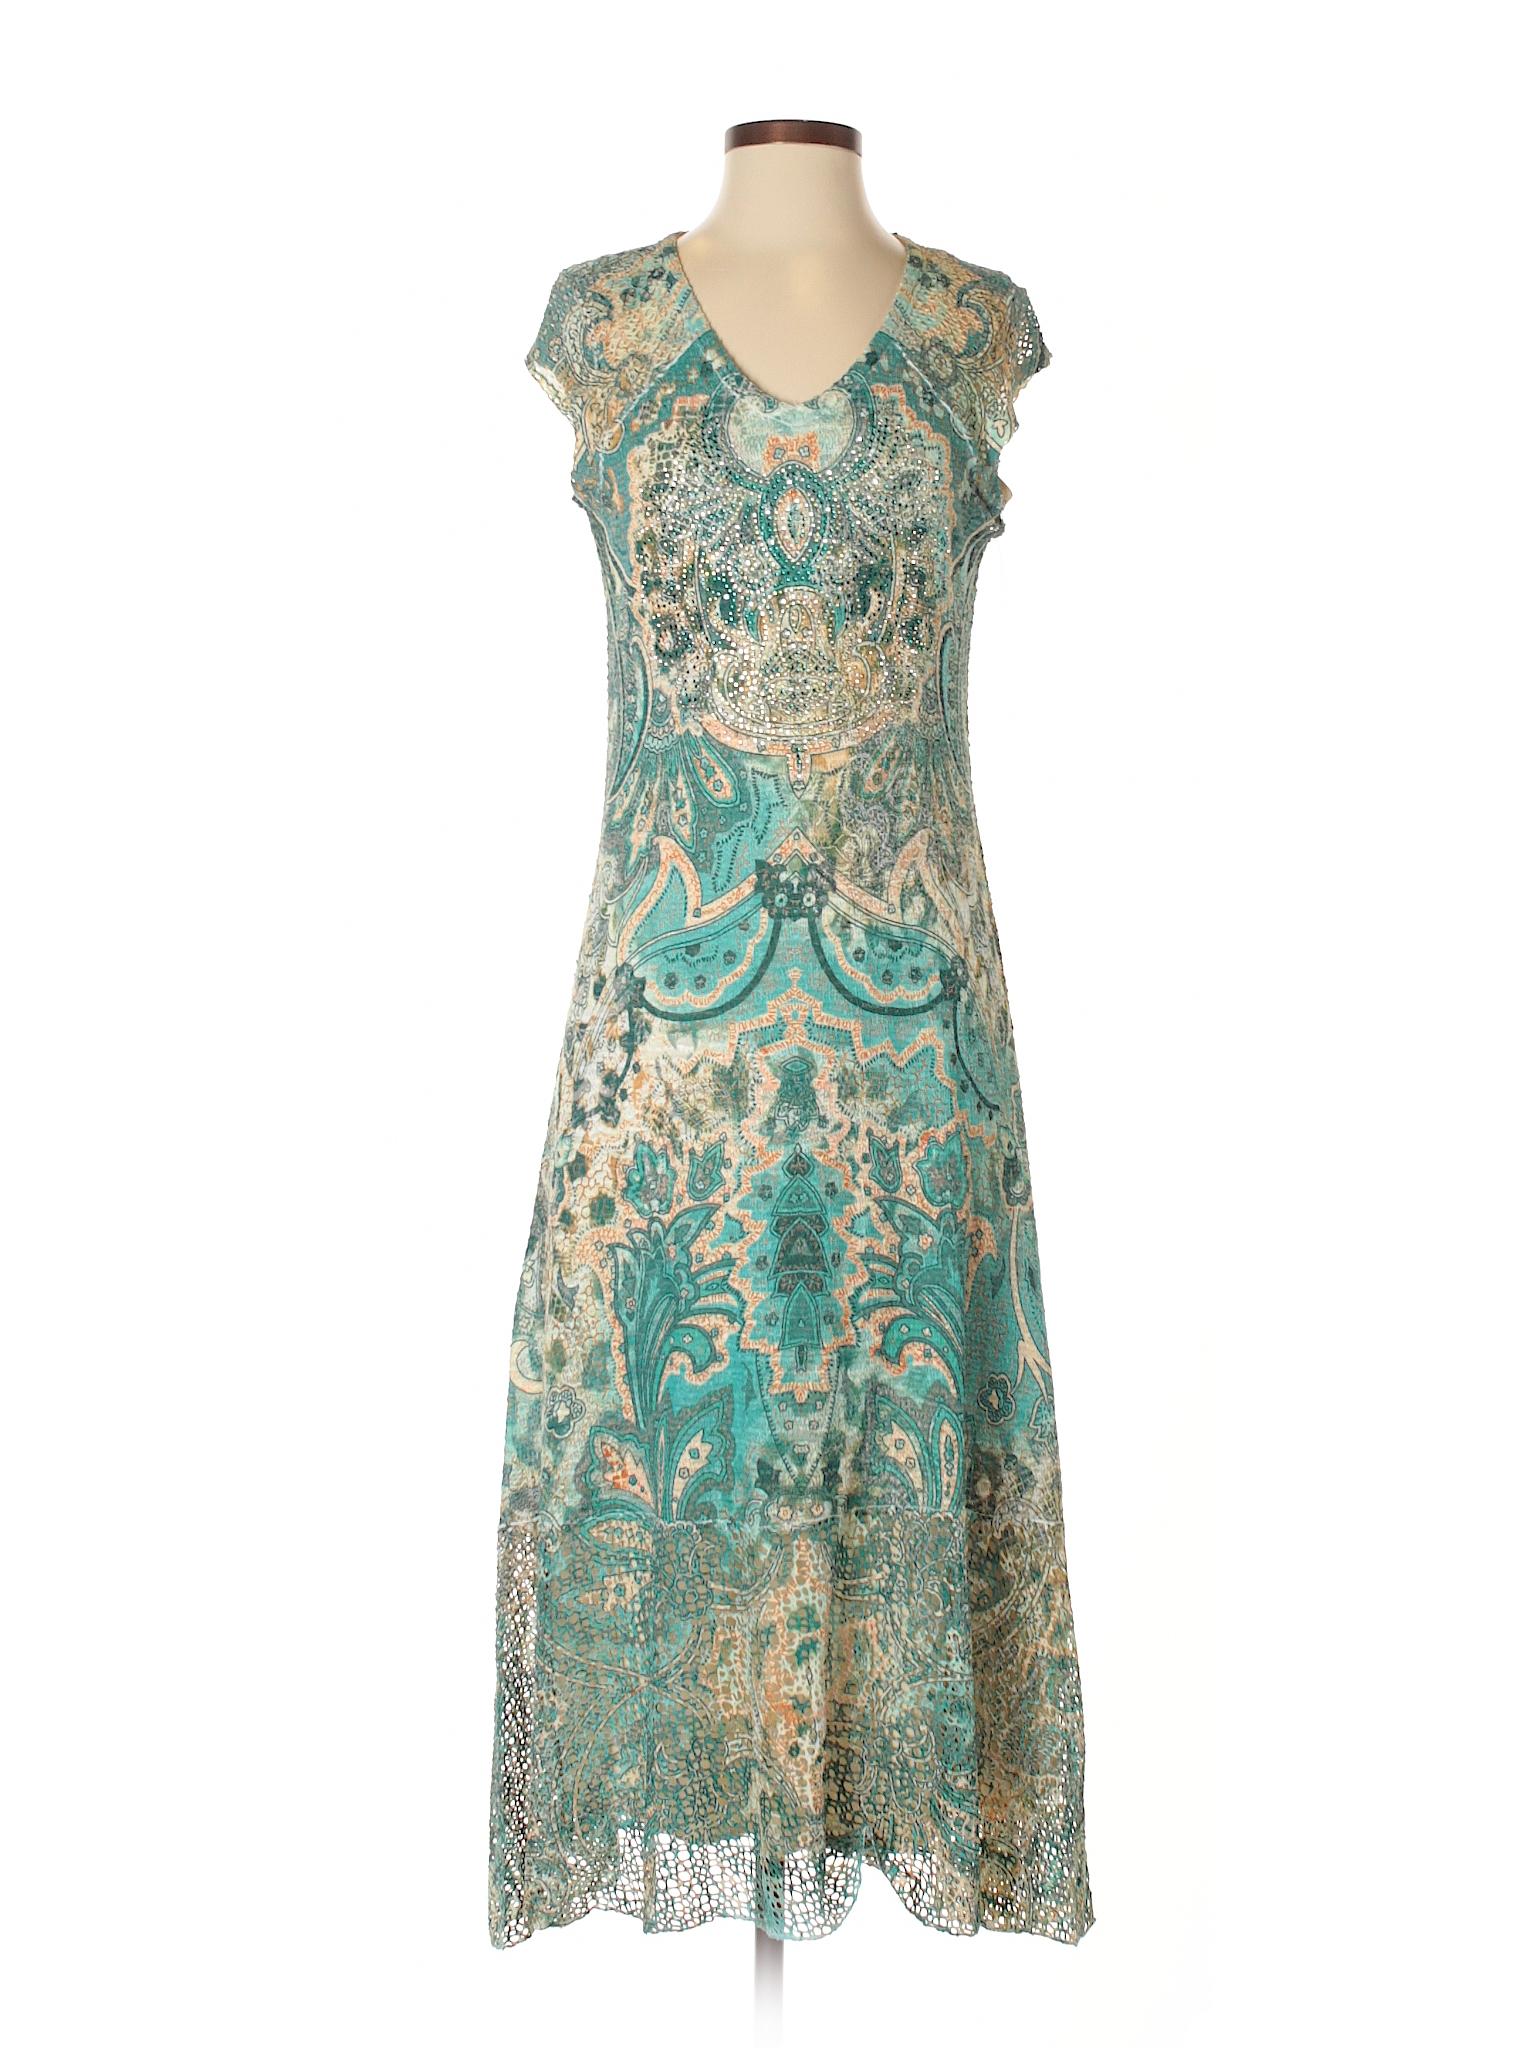 Selling Reba Dress Selling Casual Casual Reba xvazxf